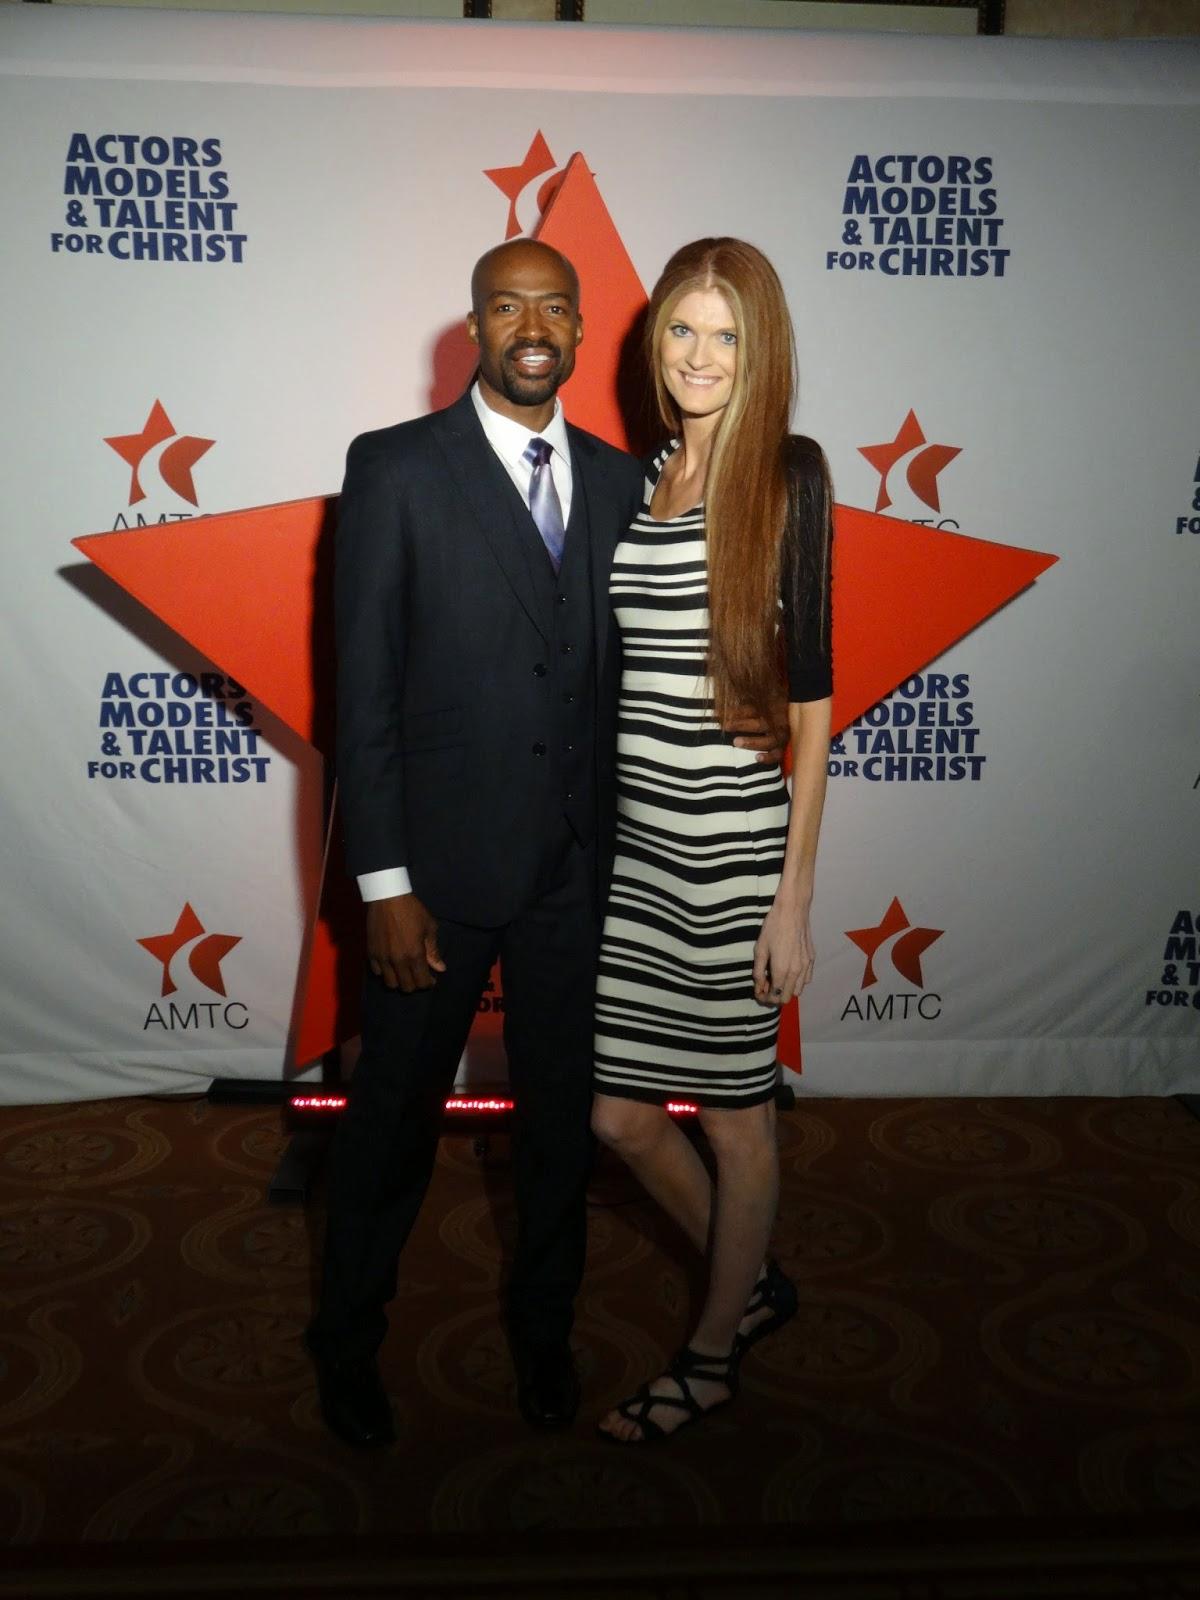 AMTC Shine 2013 Red Carpet with Wladimir and Elyssa